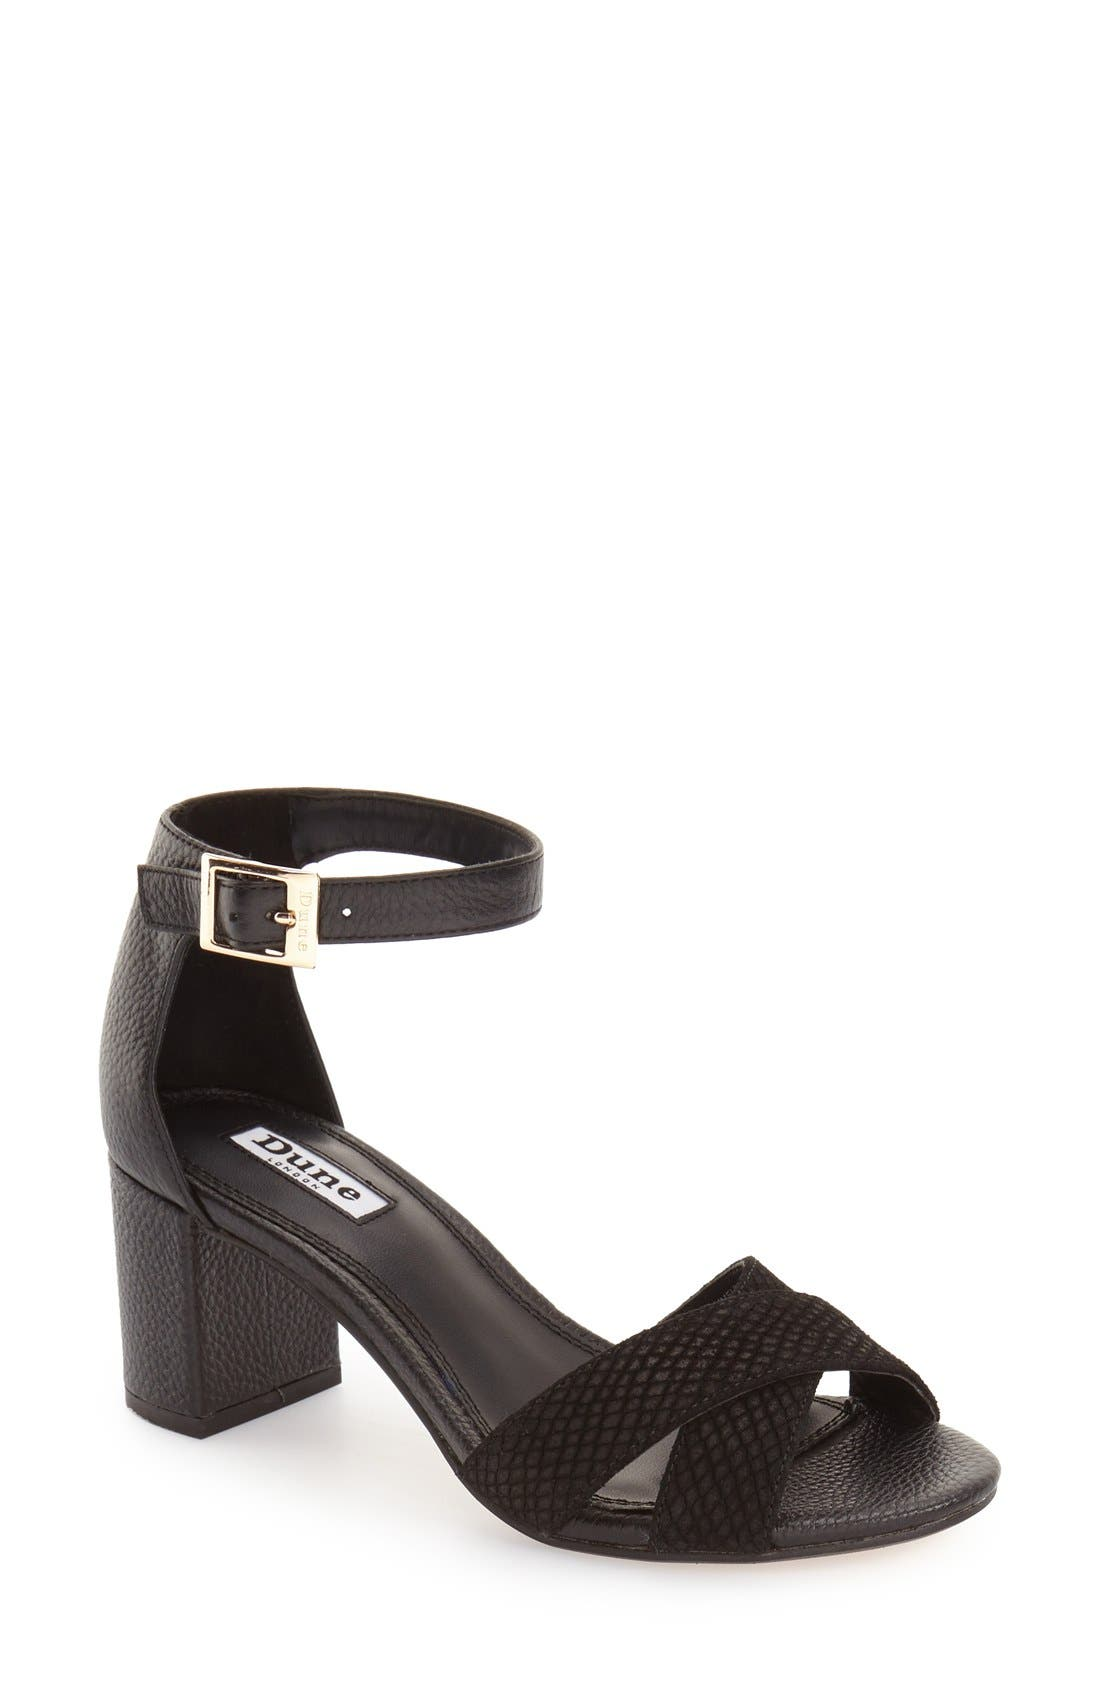 Main Image - Dune London 'Imelda' Block Heel Ankle Strap Sandal (Women)